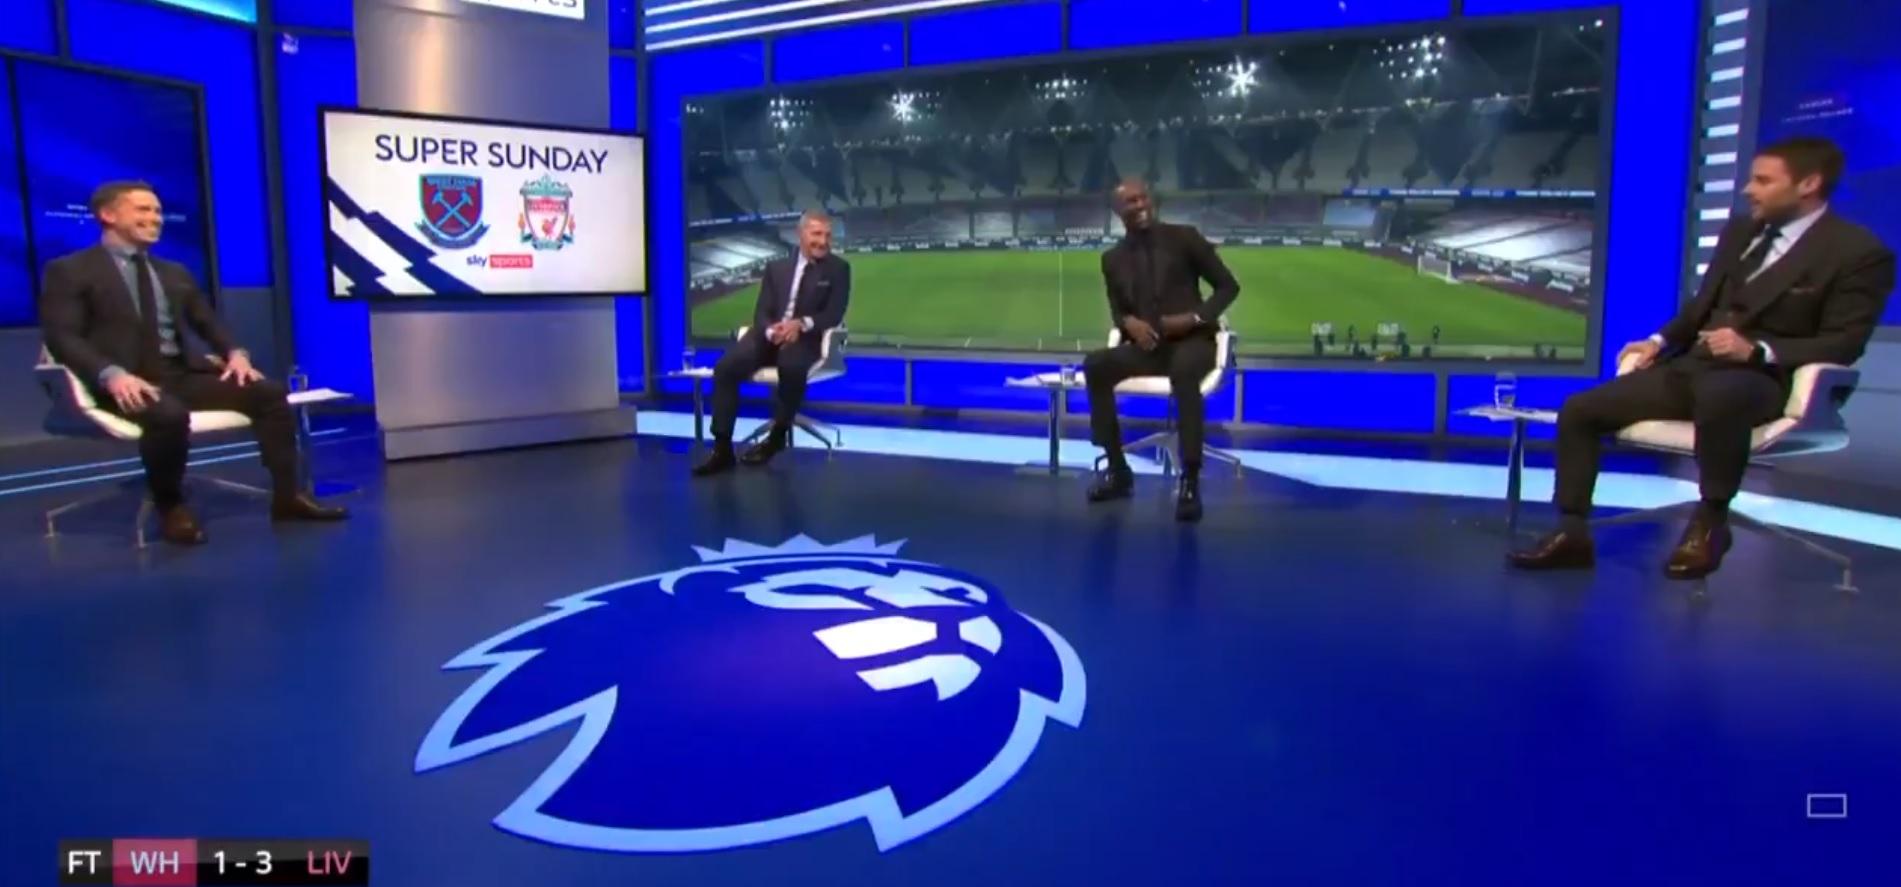 (Video) Pundits with bizarre chat over Salah greed despite forward registering two goals v West Ham